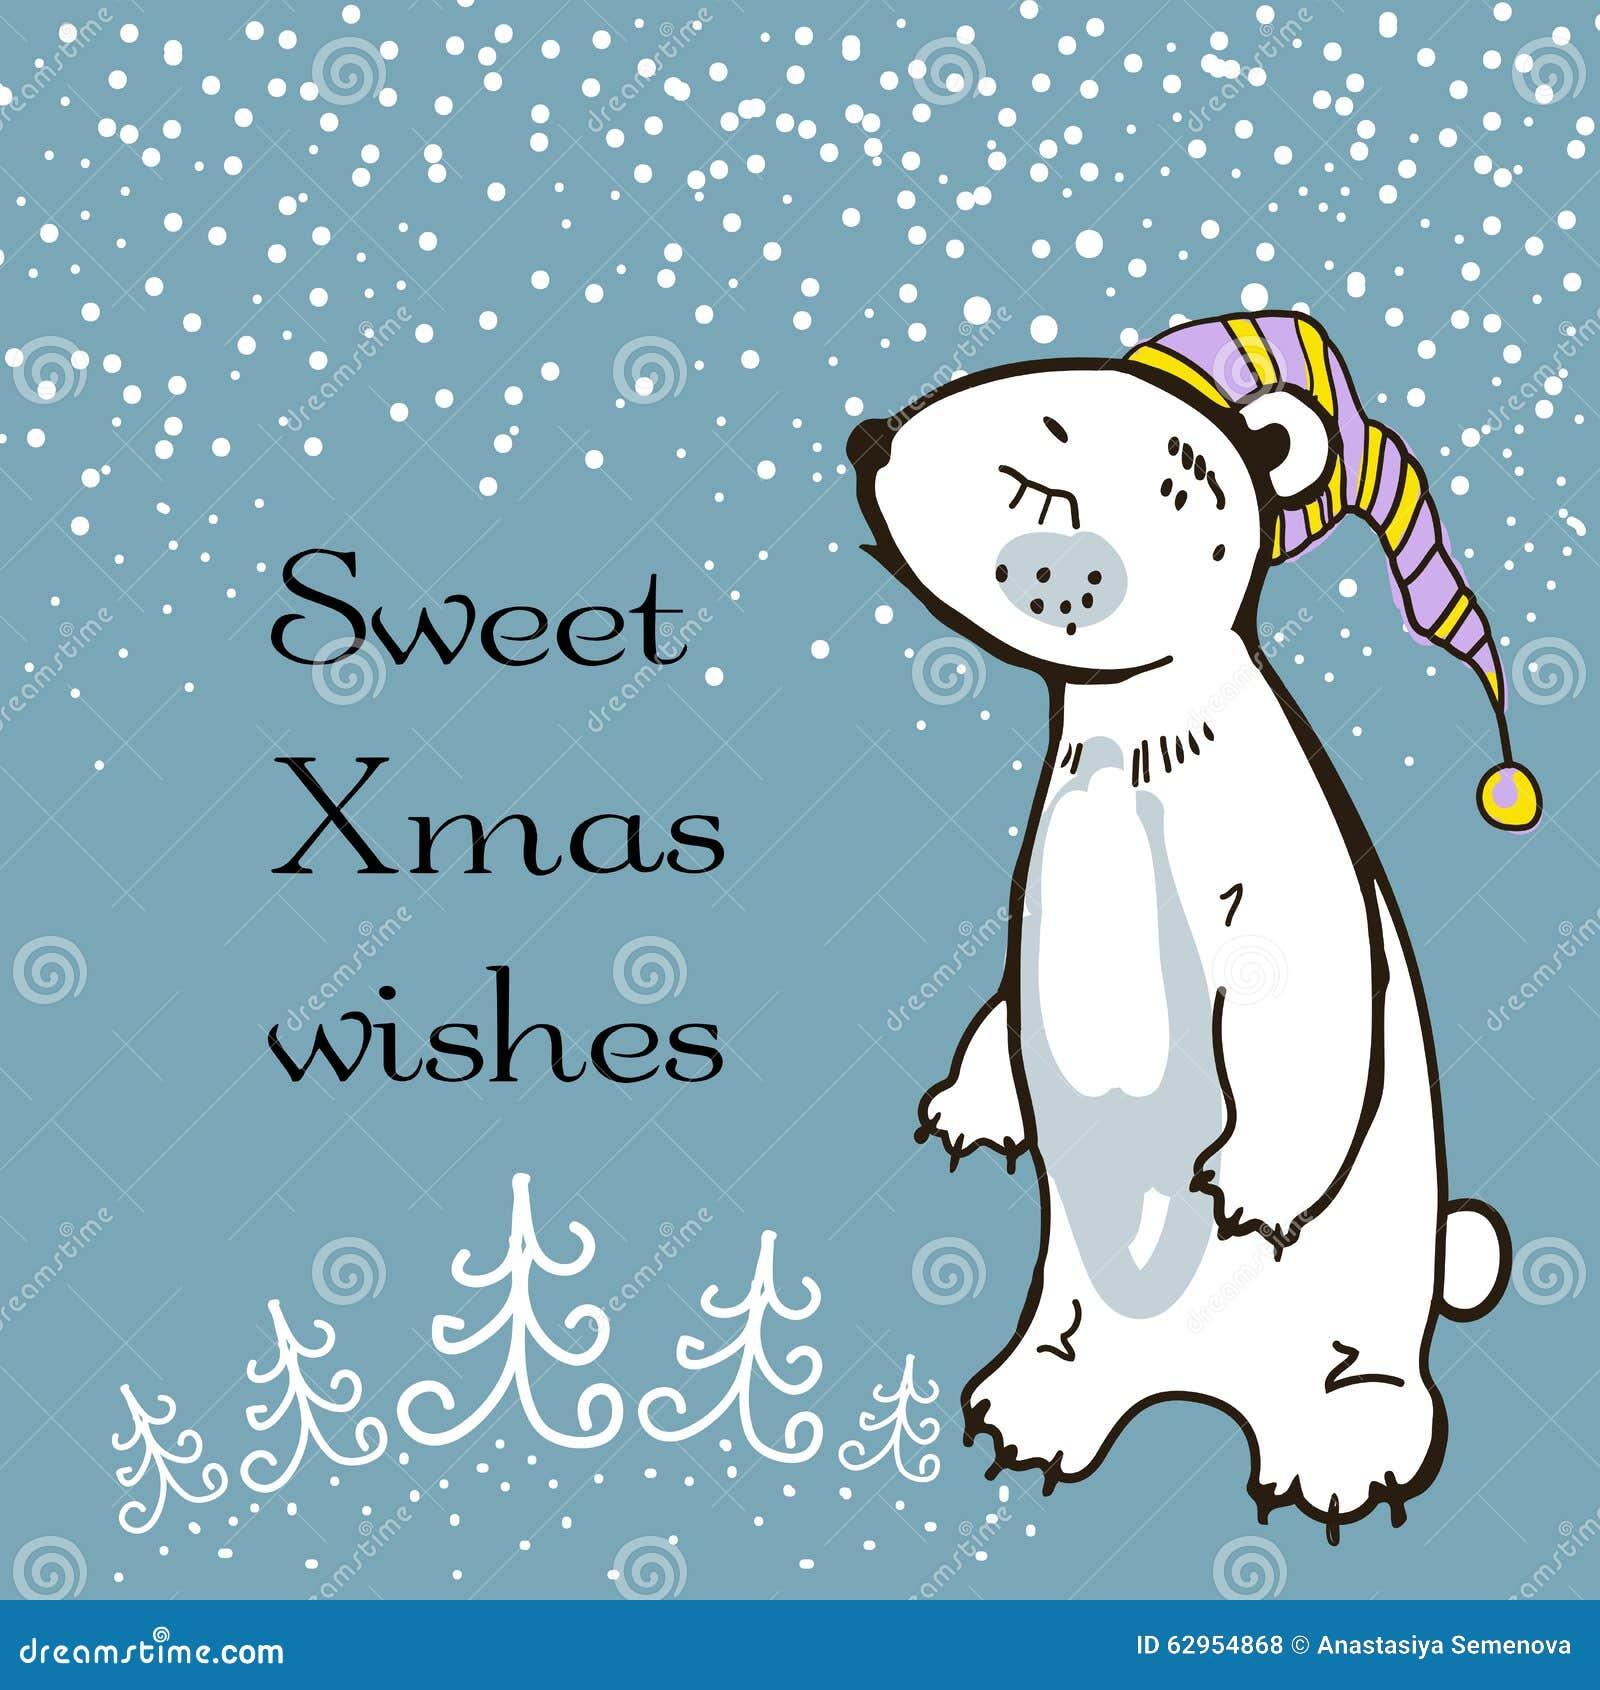 Hand Sketched Greeting Card With Sleepy Teddy-Bear. Christmas Vector ...